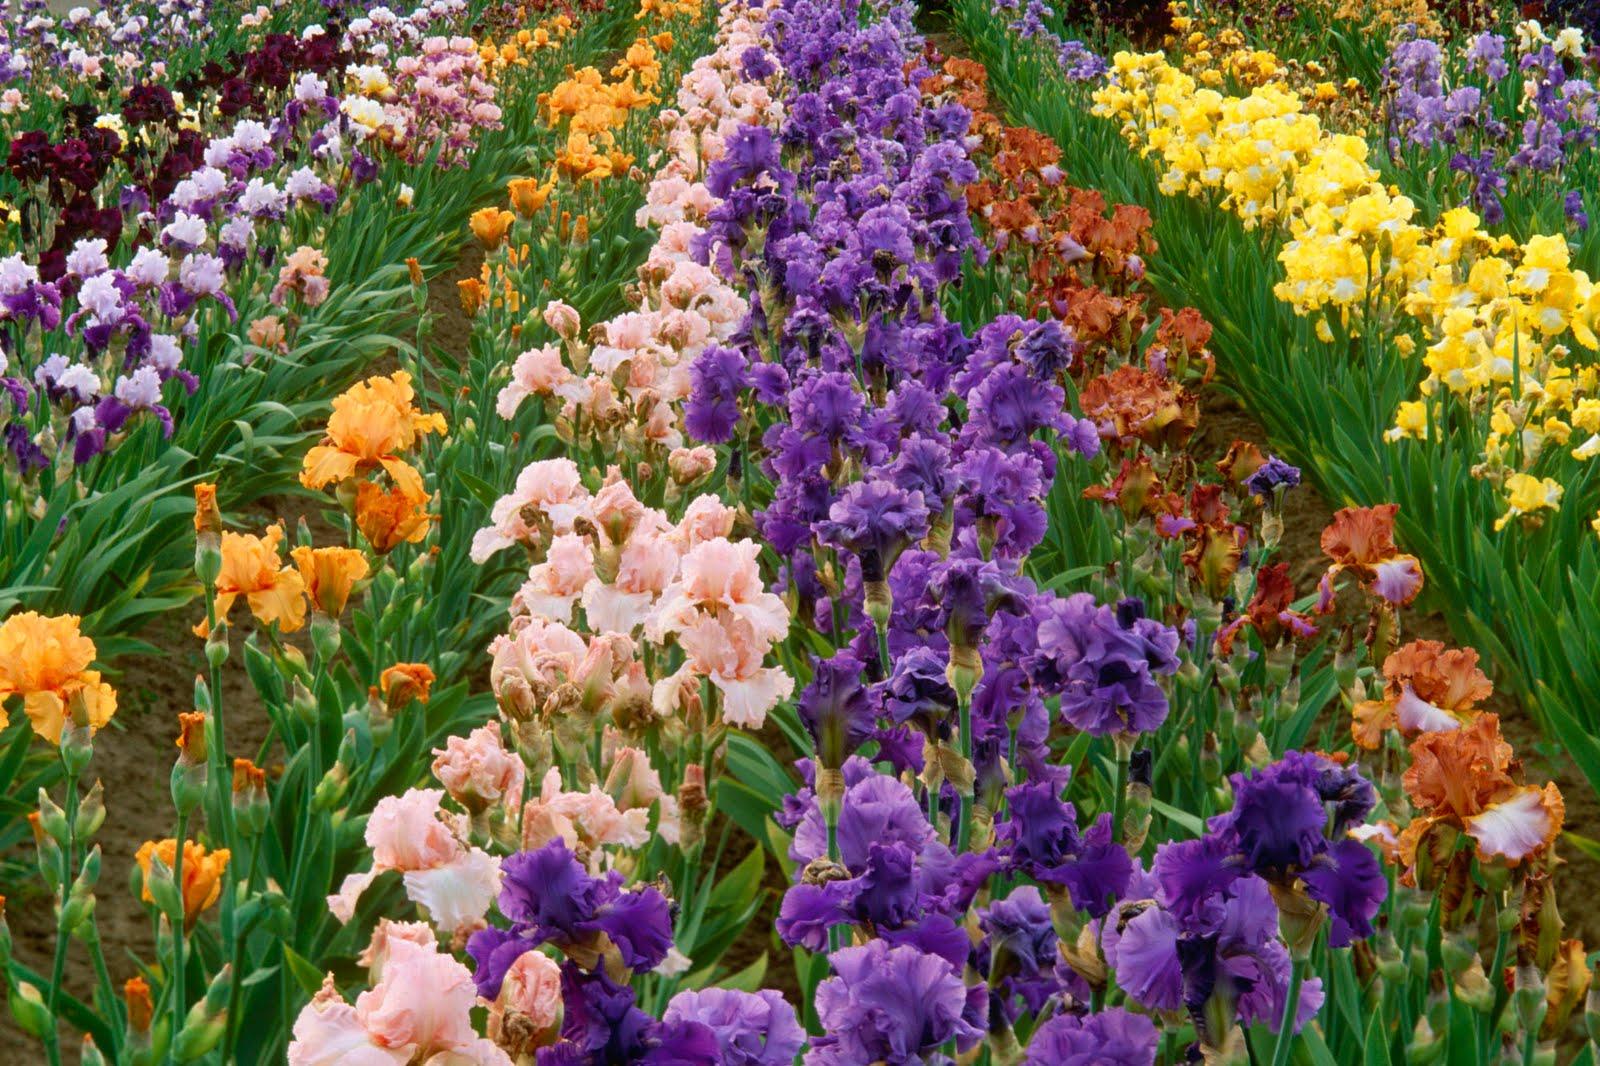 flower garden flower forest cool wallpapers wonderful flower garden 1600x1066